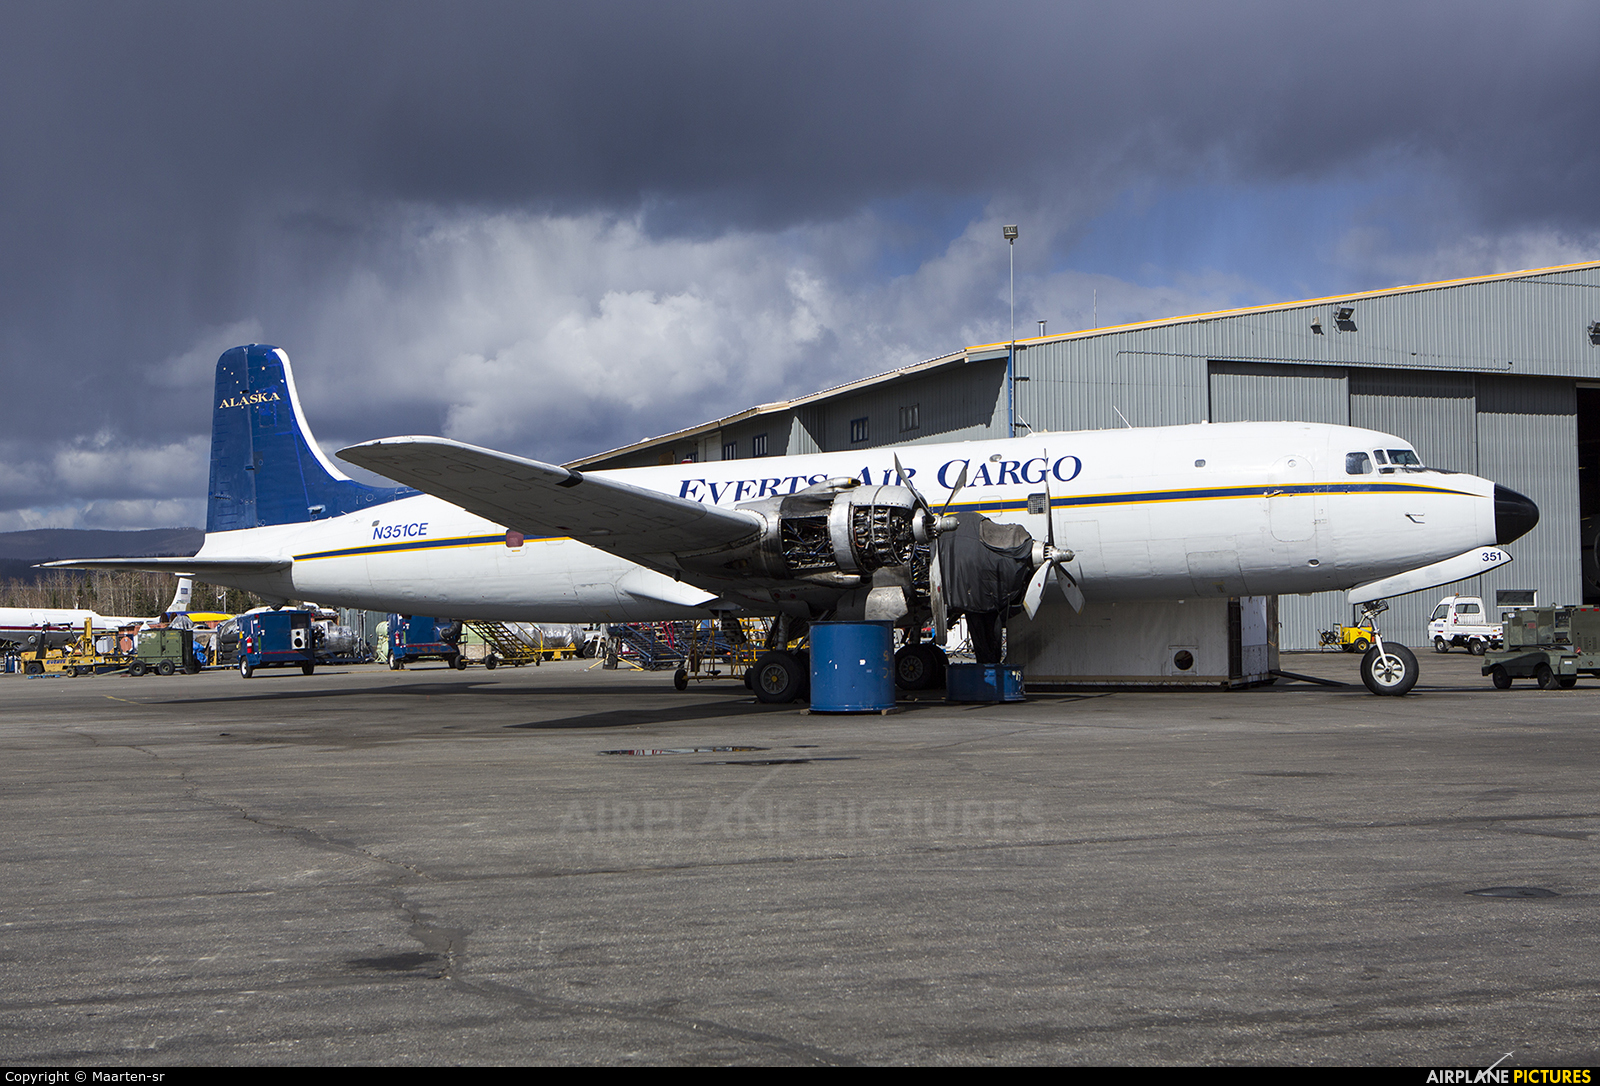 Everts Air Cargo N351CE aircraft at Fairbanks Intl